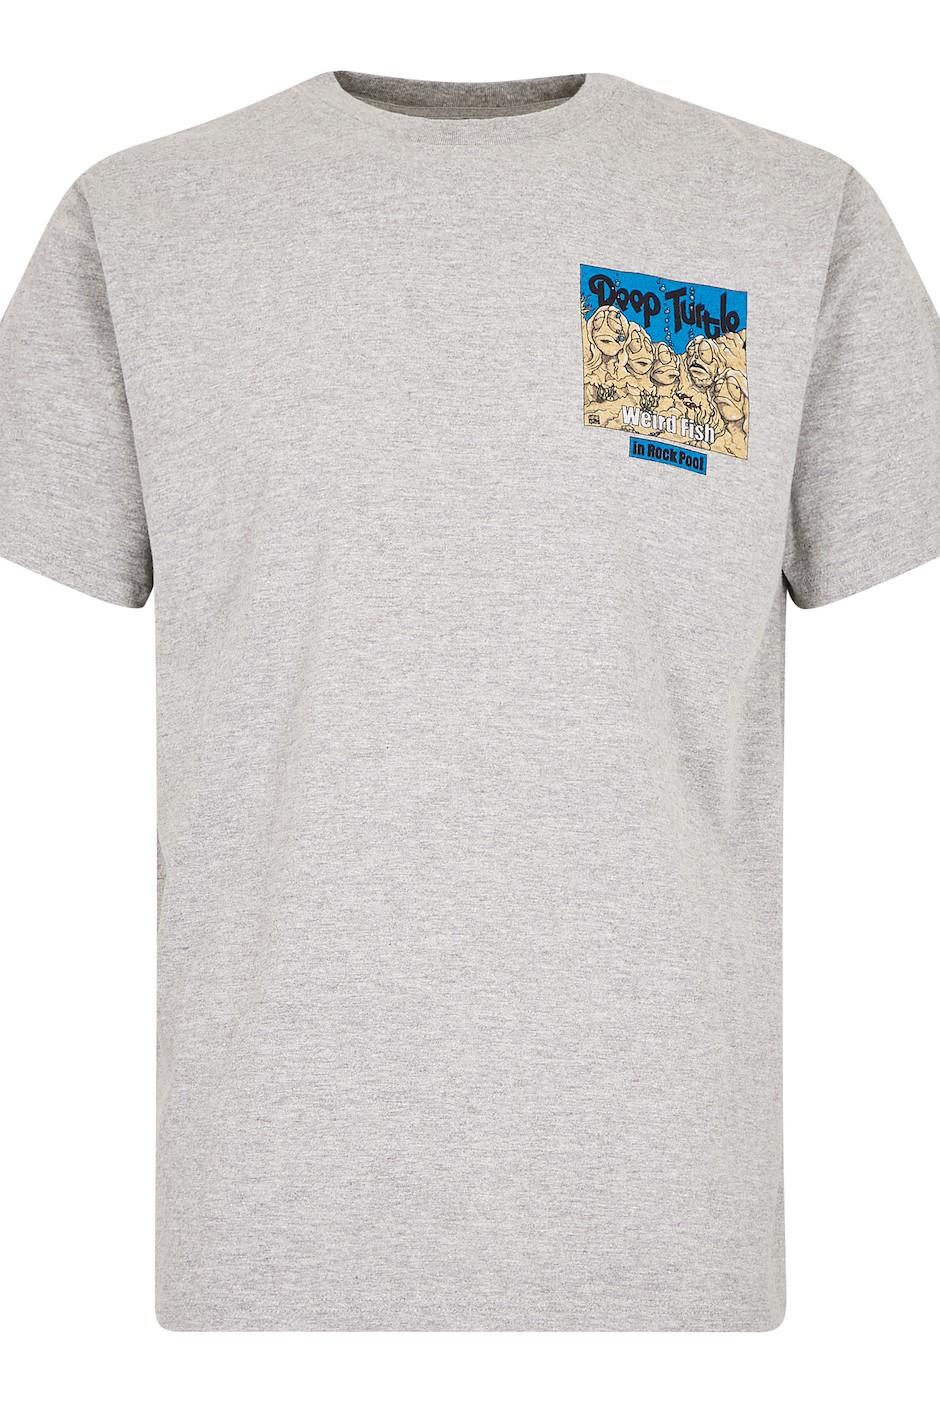 Deep Turtle Artist T-Shirt Grey Marl